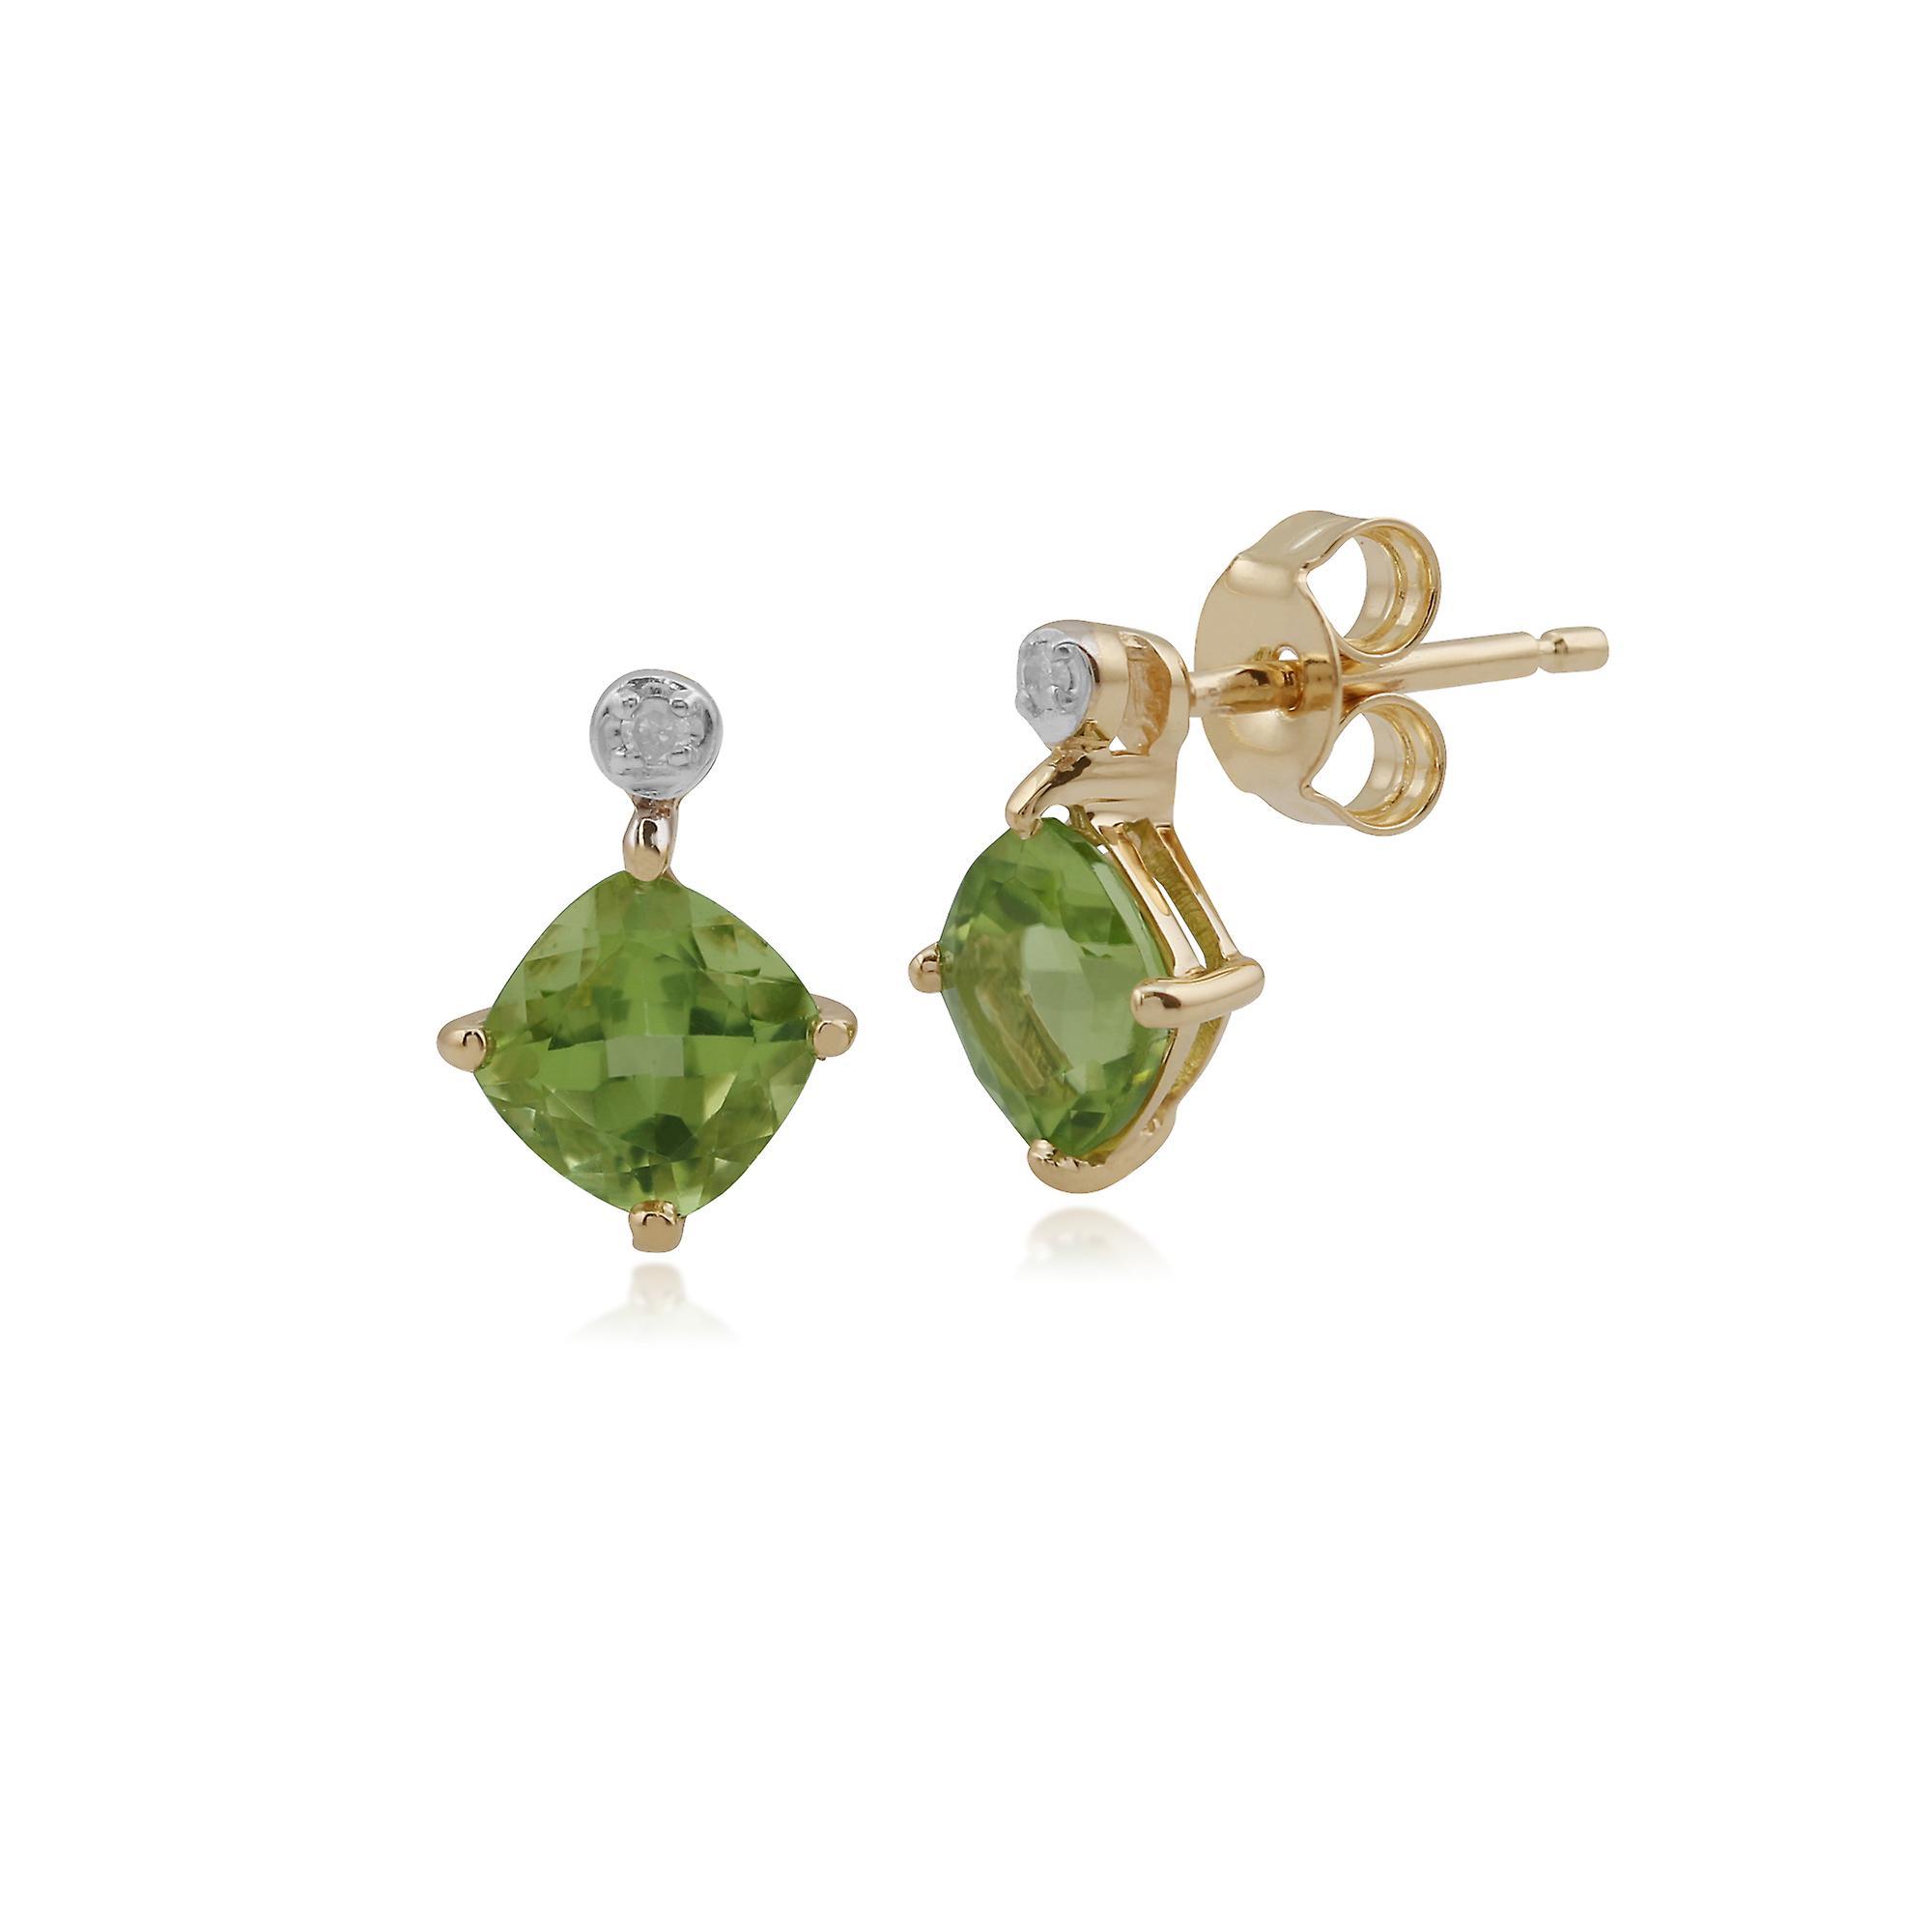 Gemondo 9ct Yellow Gold 1.26ct Peridot & Diamond Stud Earrings